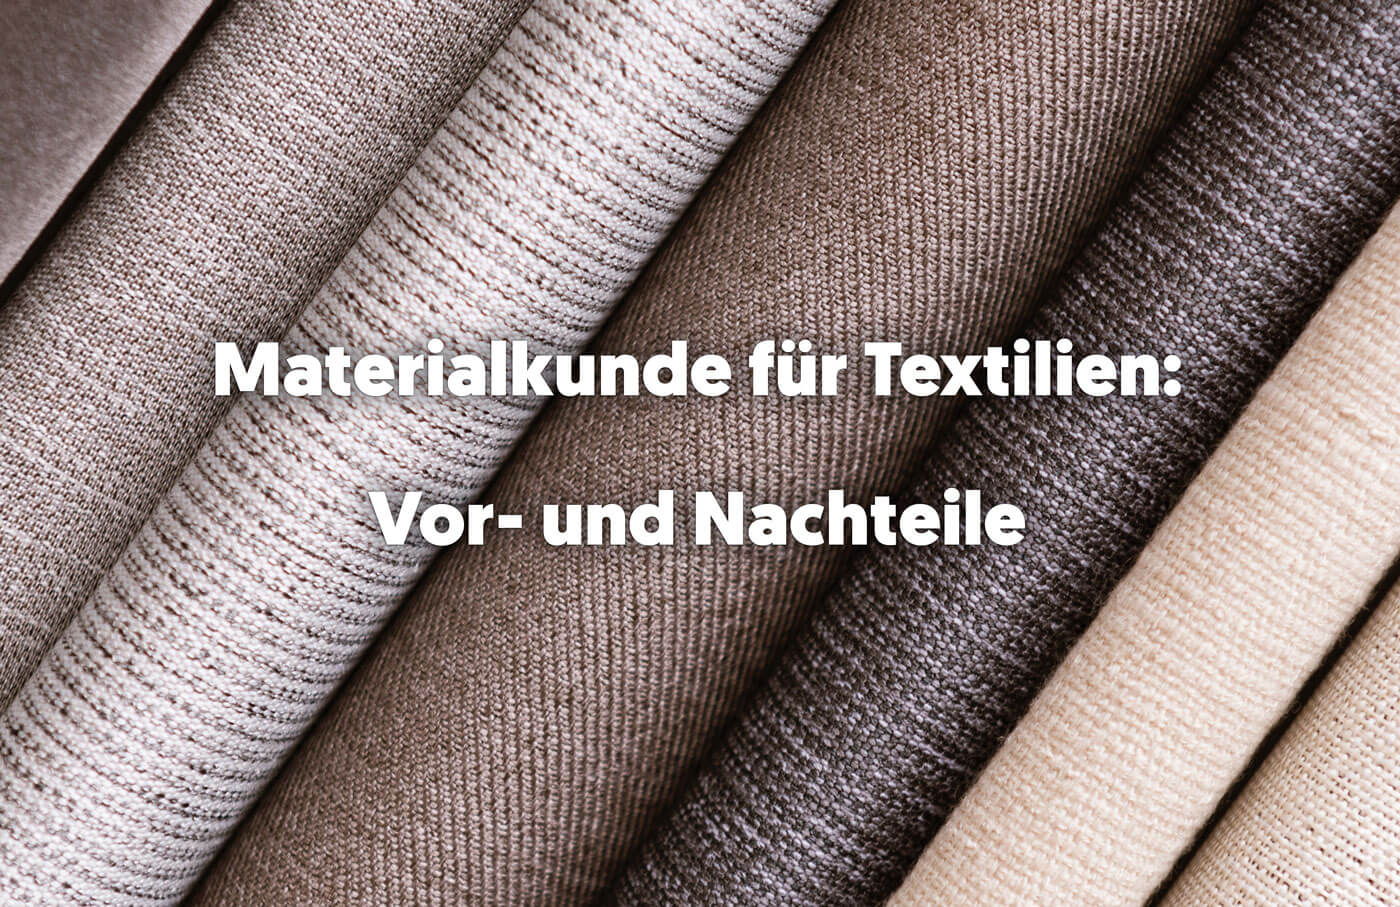 materialkunde fuer textilien